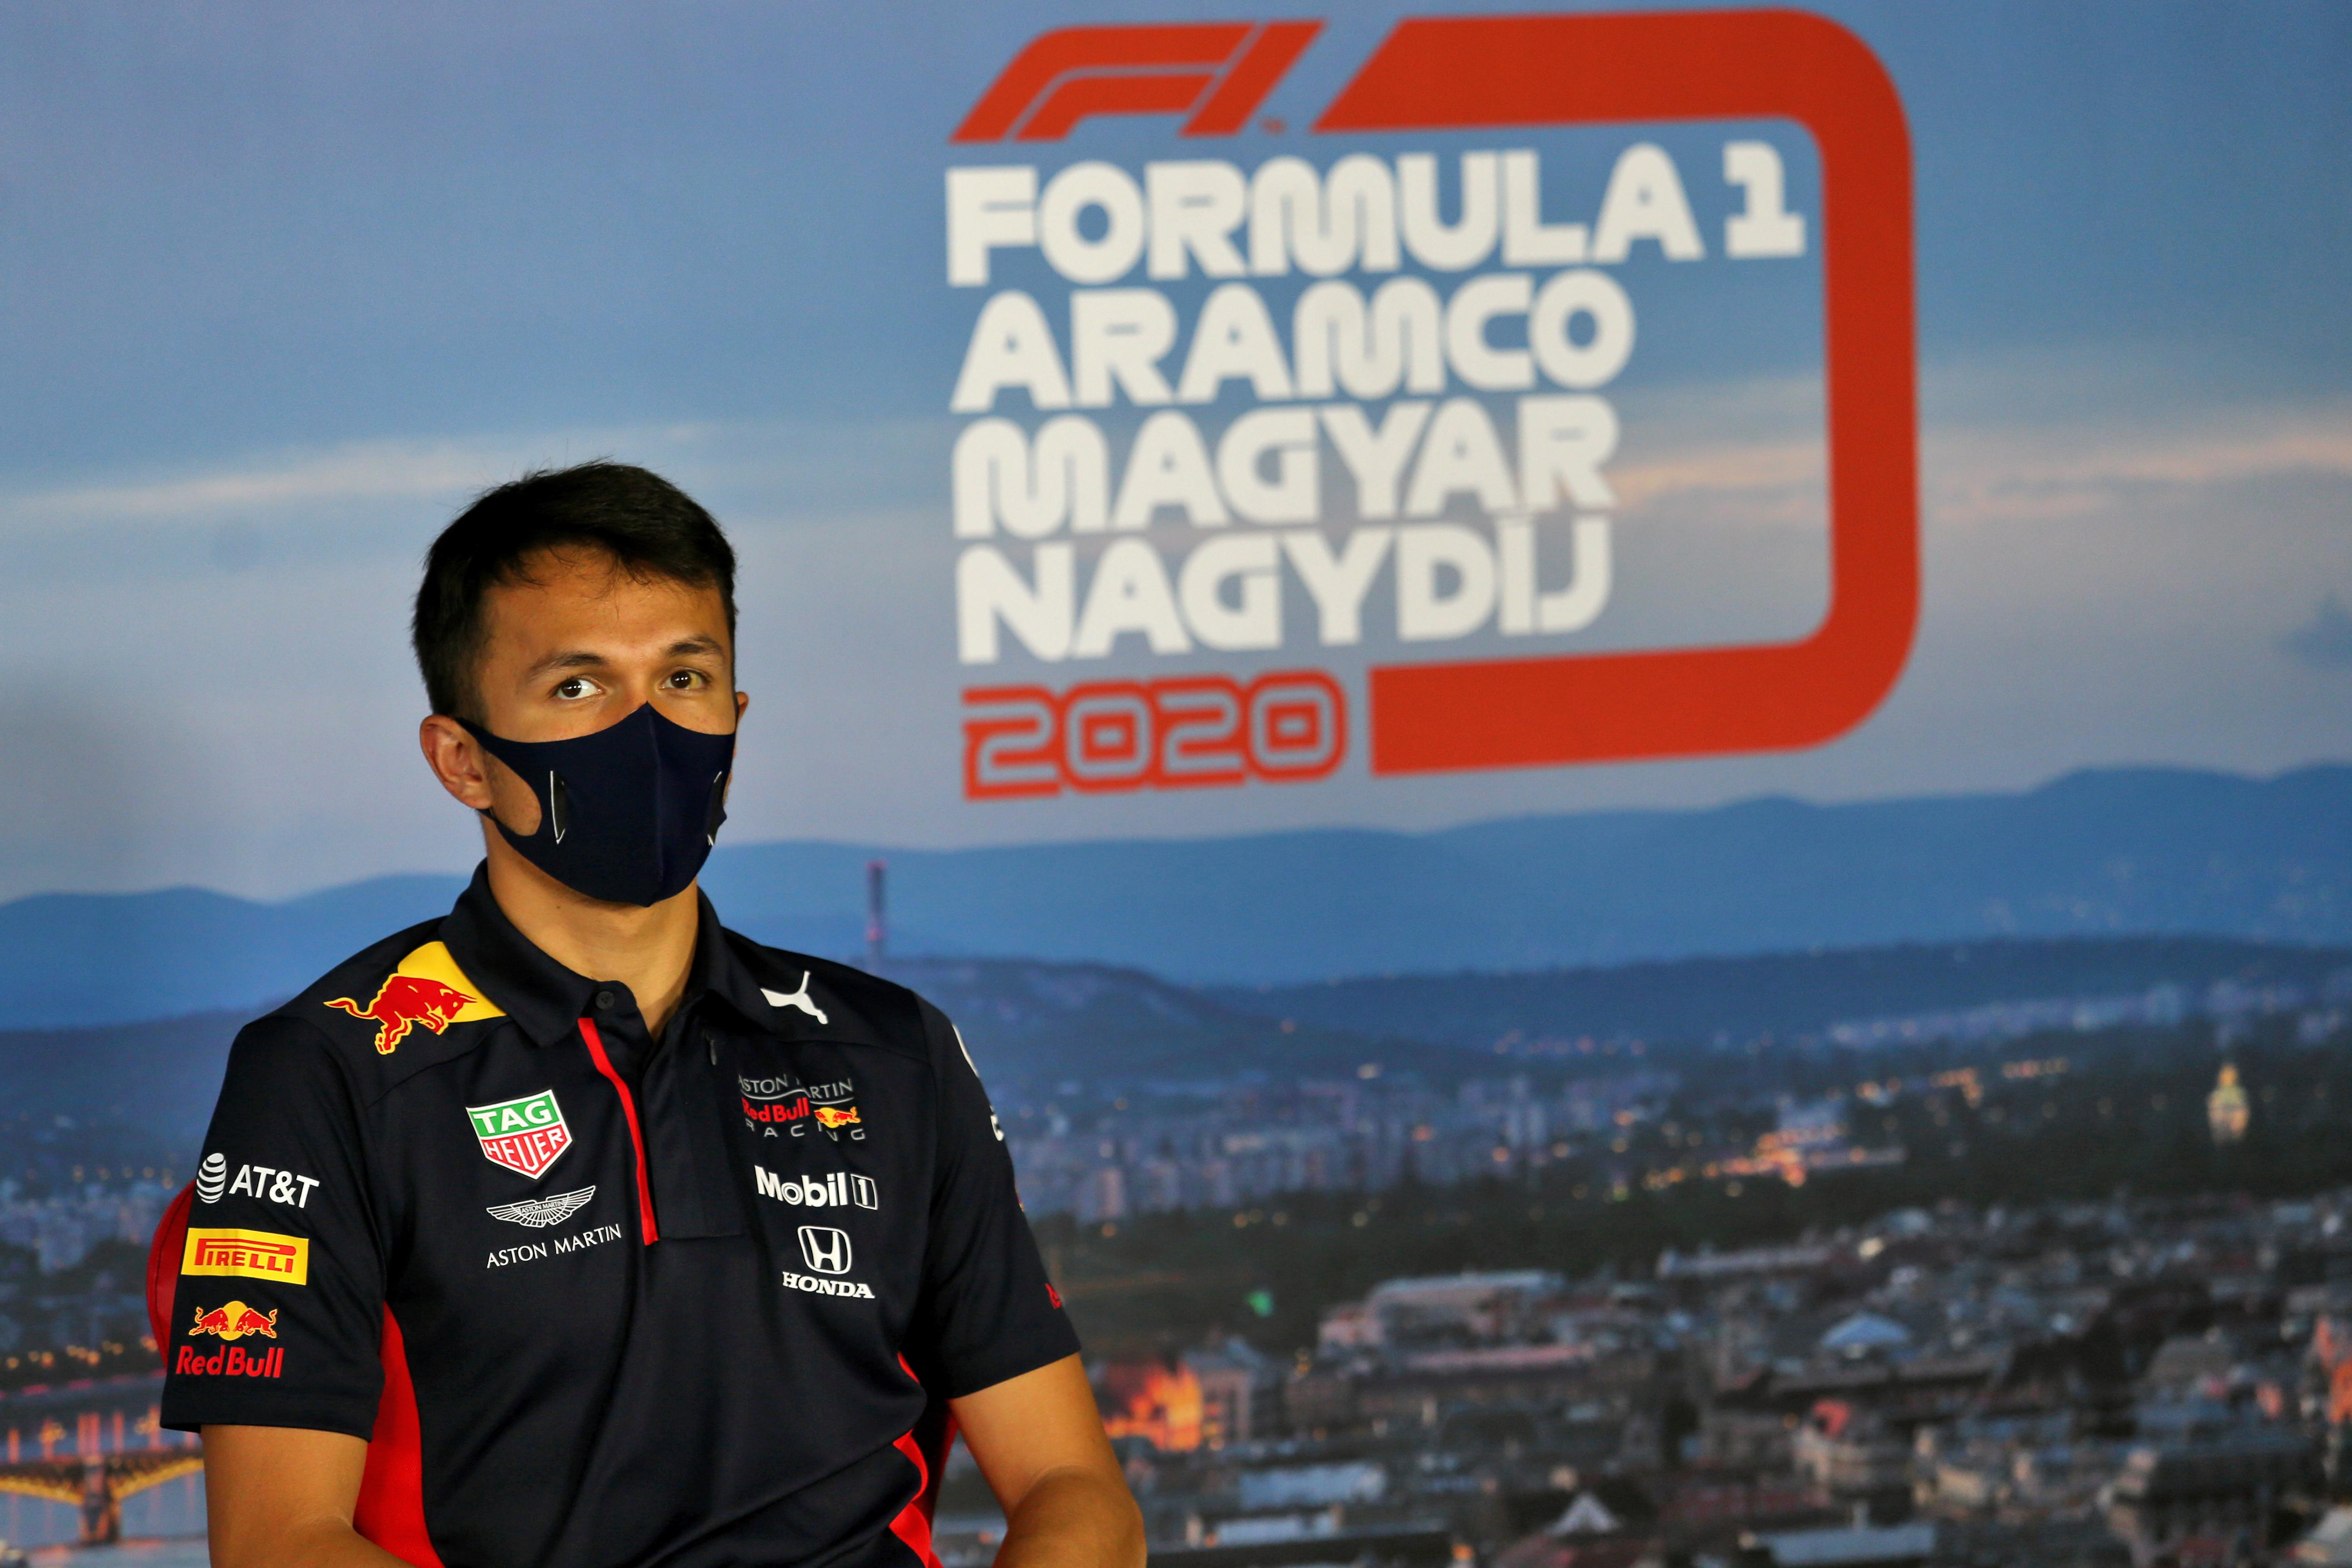 Motor Racing Formula One World Championship Hungarian Grand Prix Preparation Day Budapest, Hungary